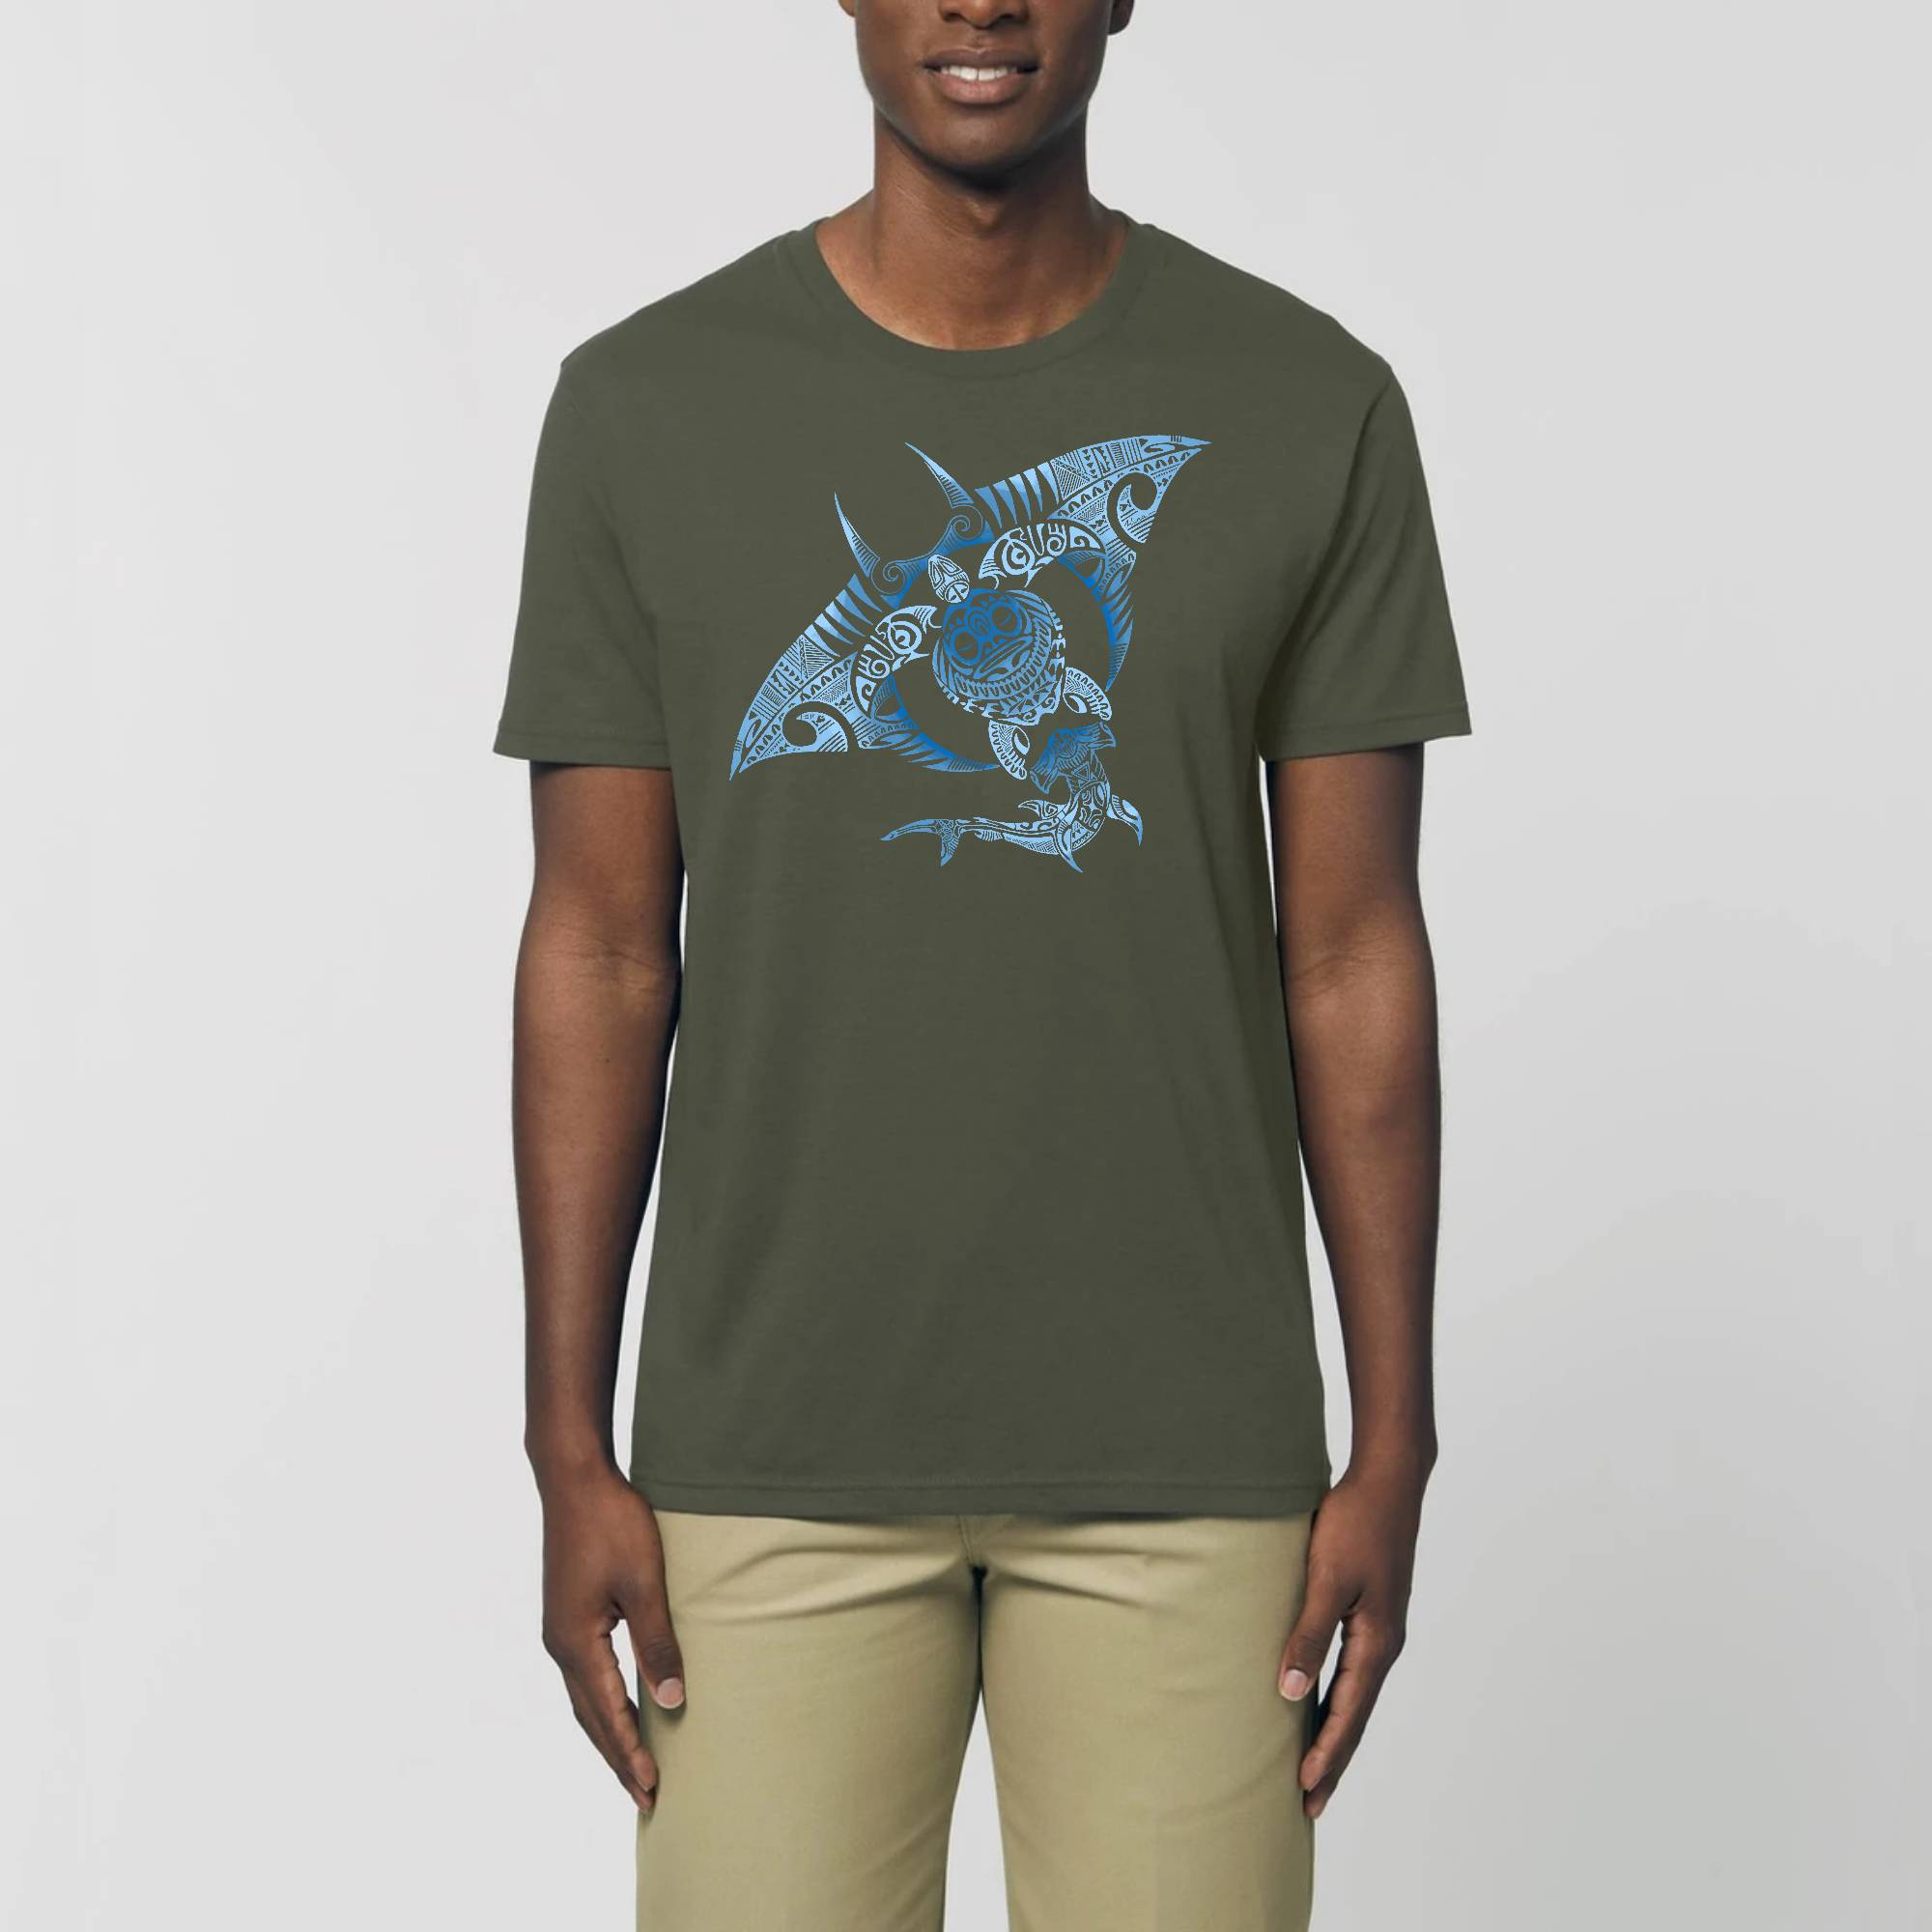 4 Elements Shadows - T-shirt Unisexe Bio ROCKER